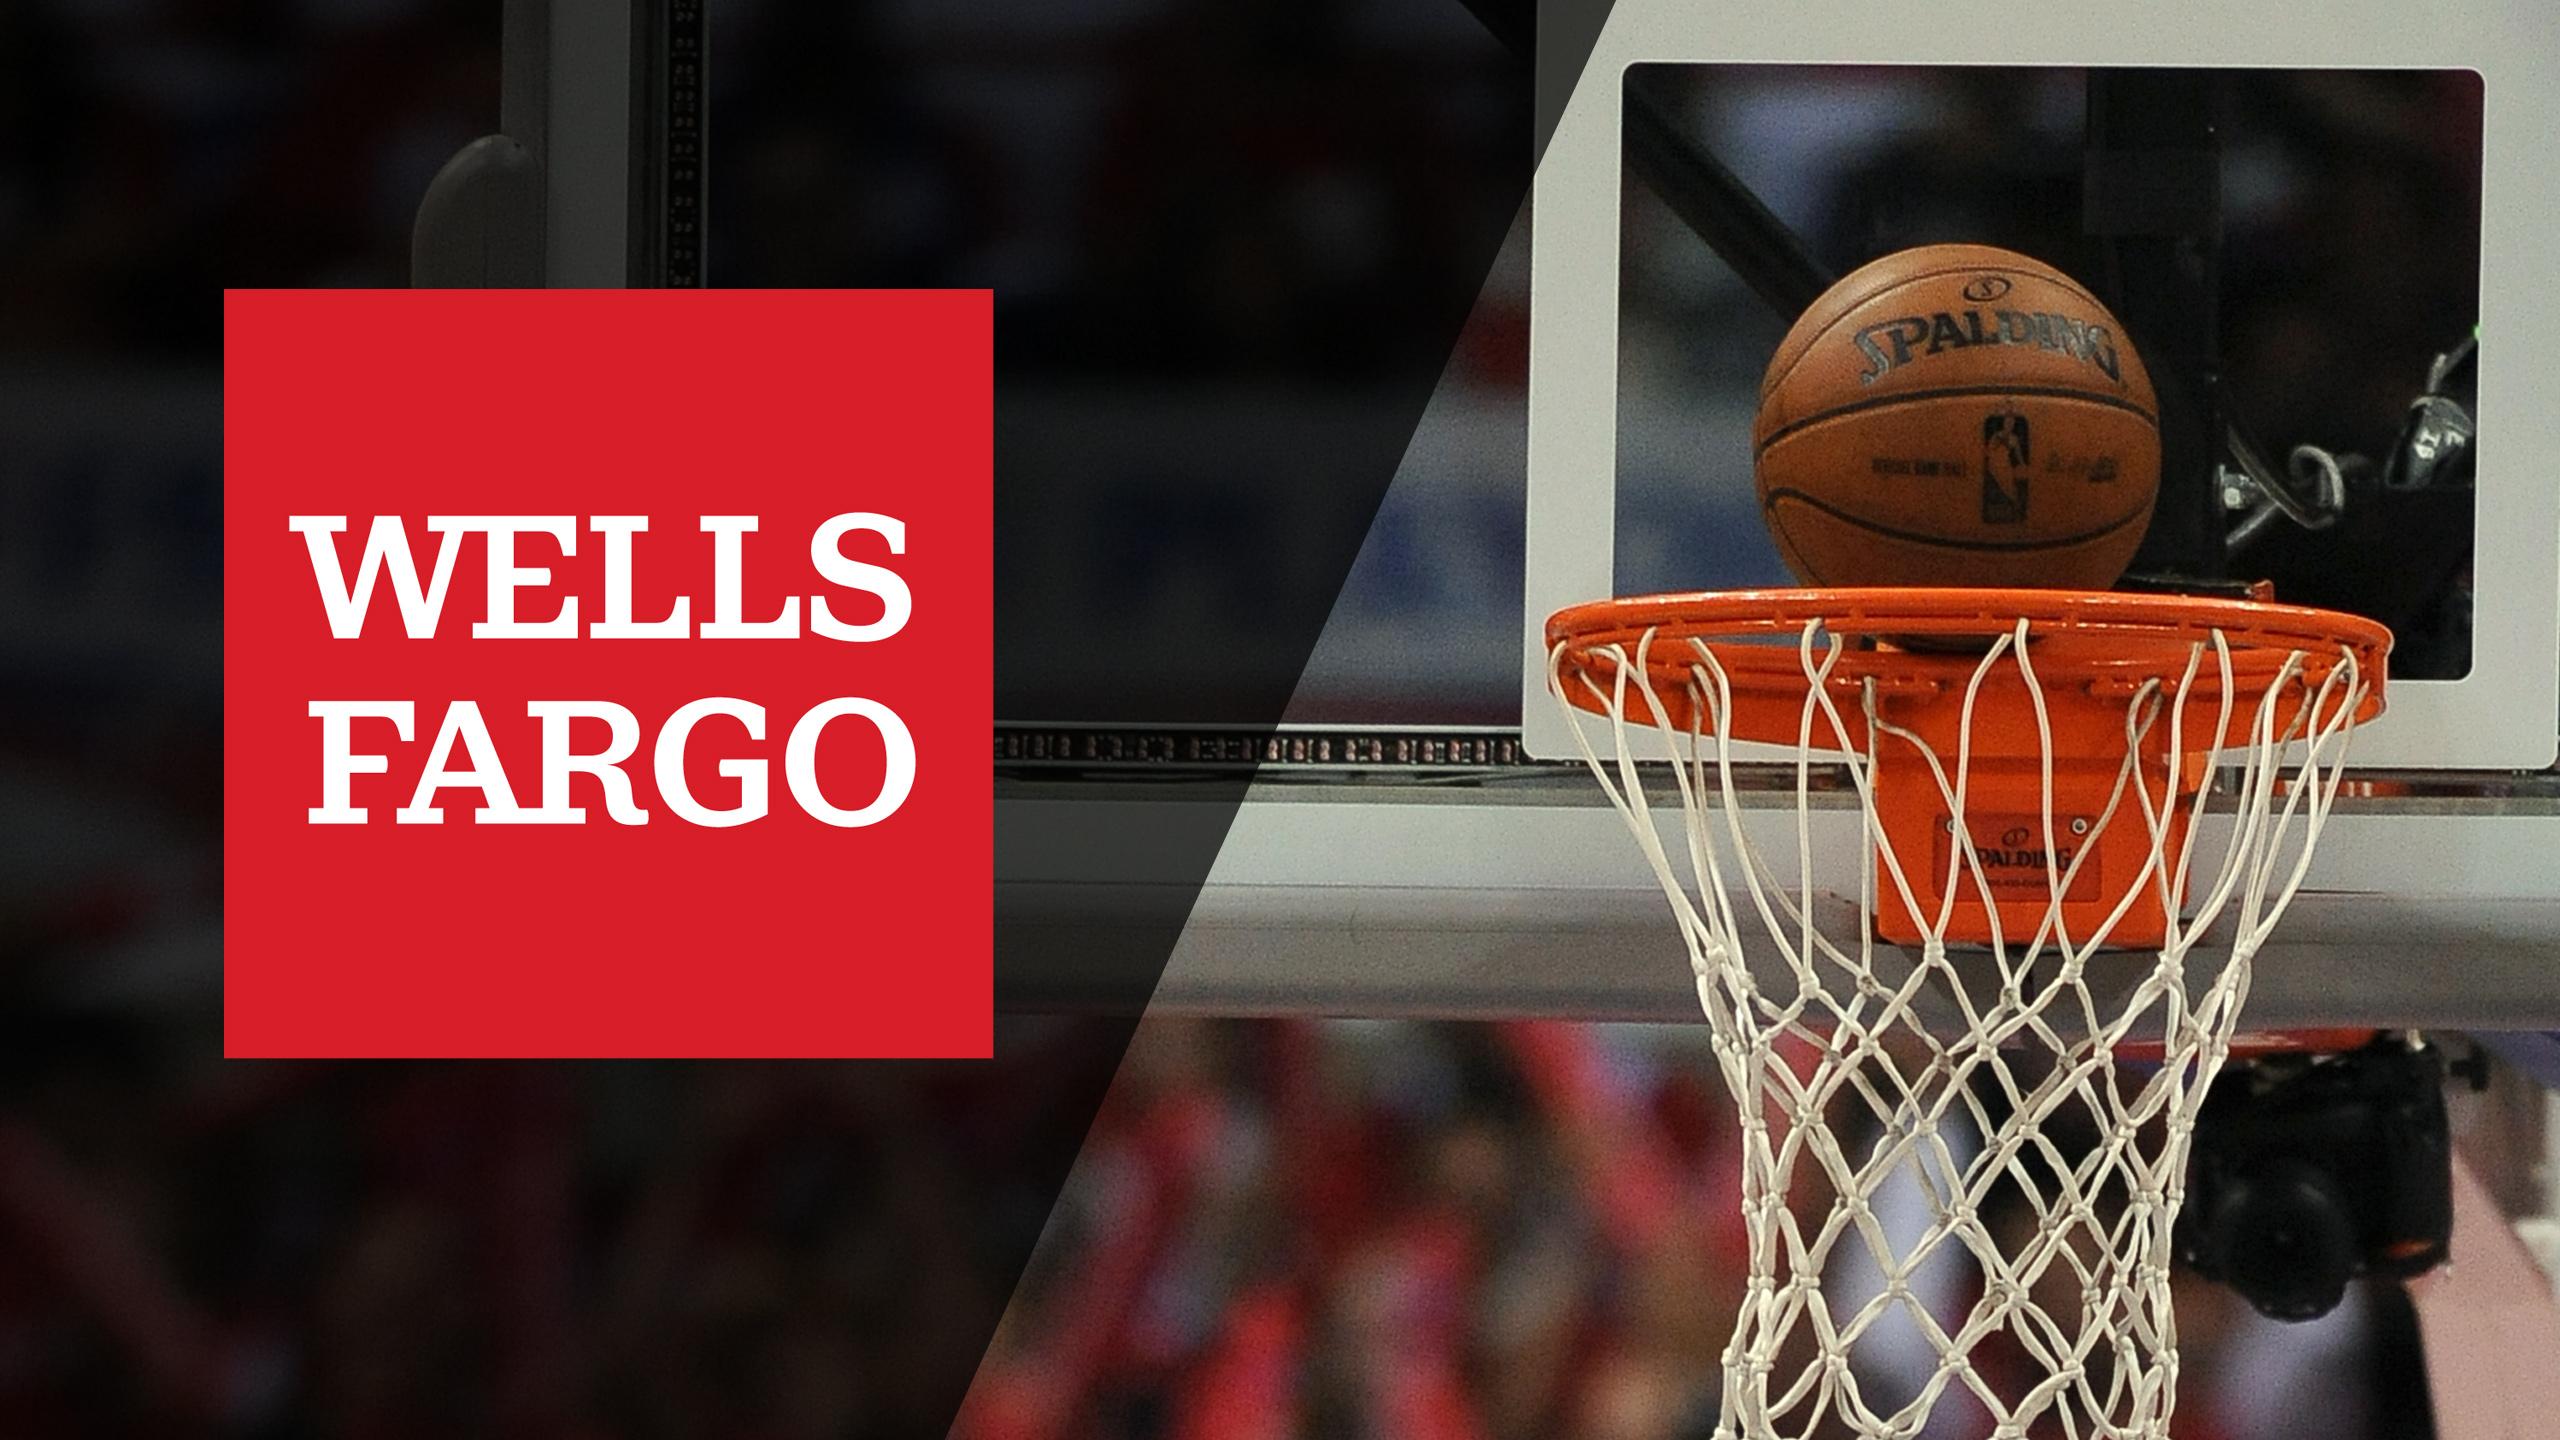 Wells Fargo Above the Rim - Milwaukee Bucks vs. Detroit Pistons (First Round, Game 3)